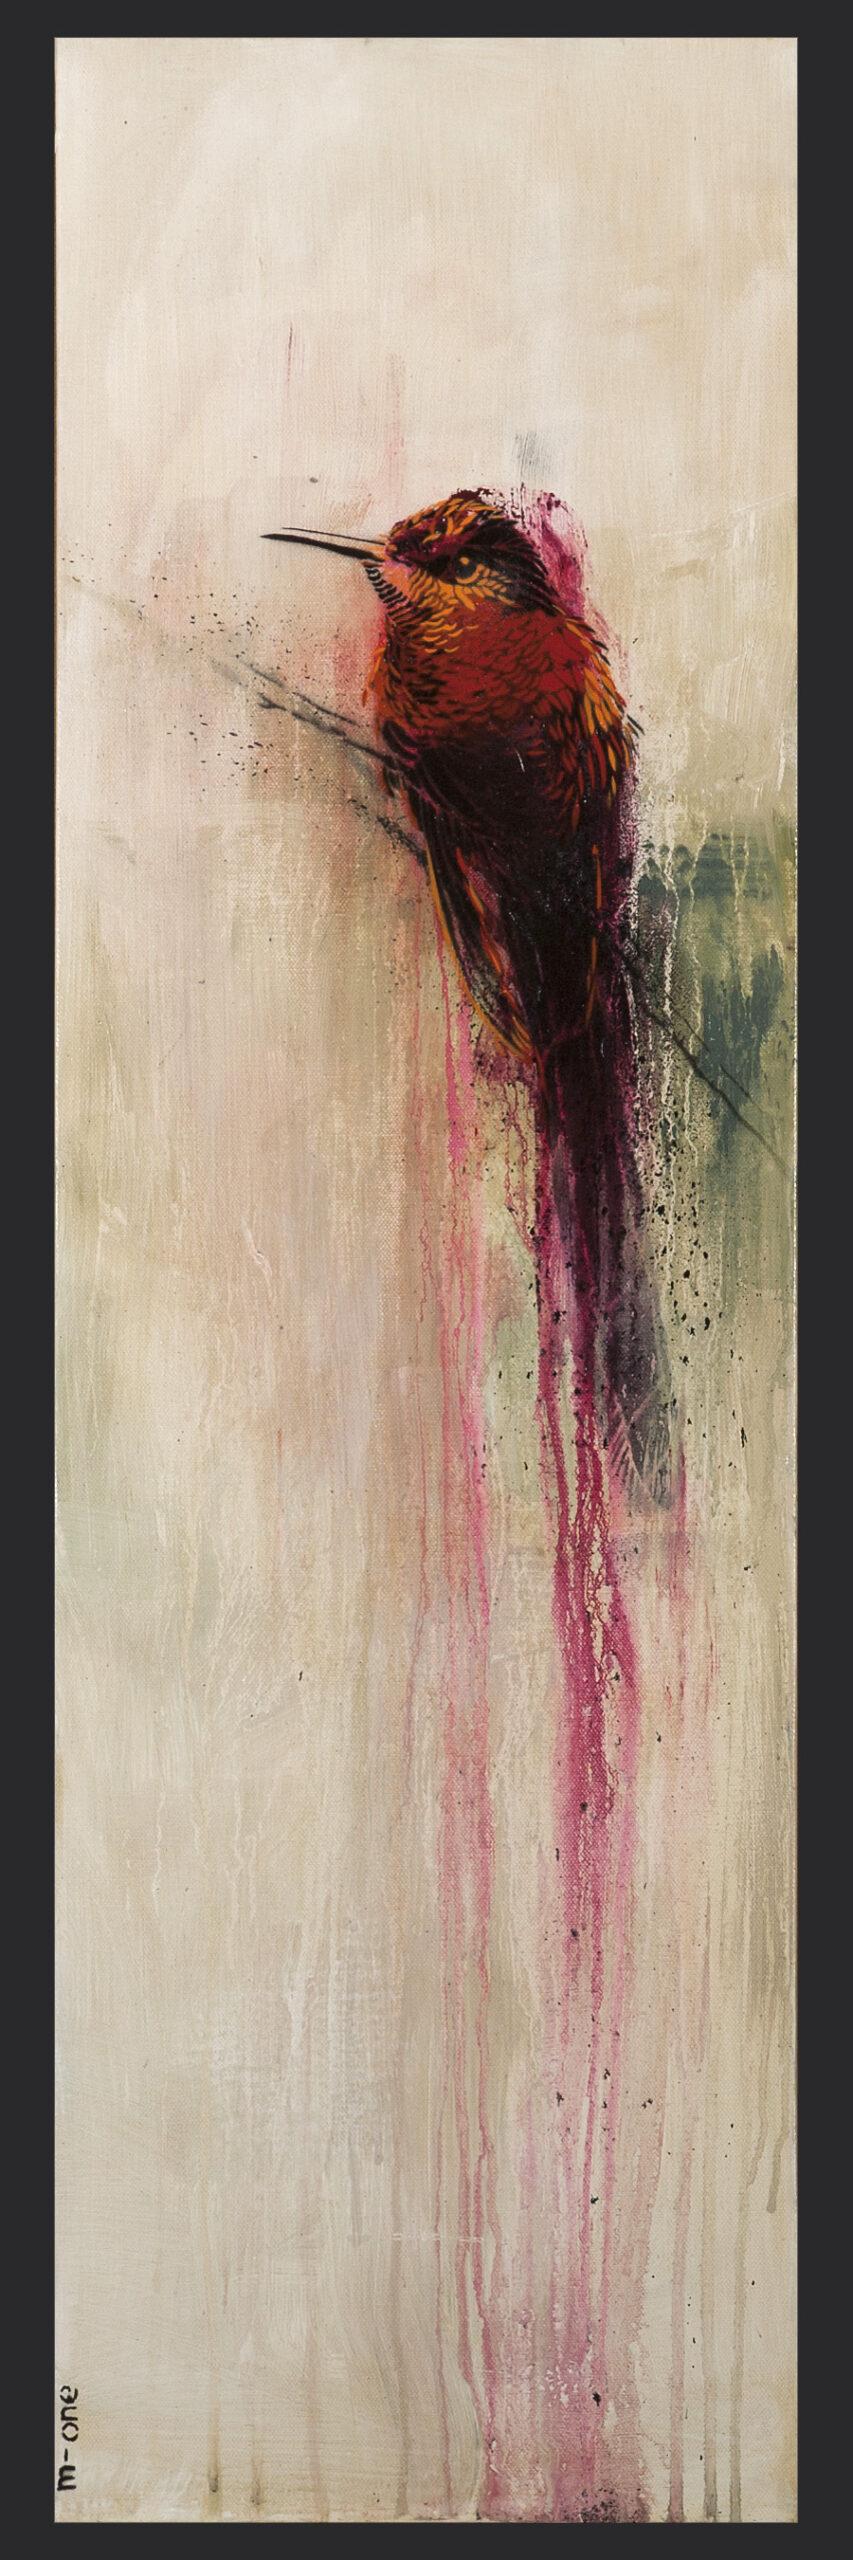 Living Art - M-One - Hummingbird